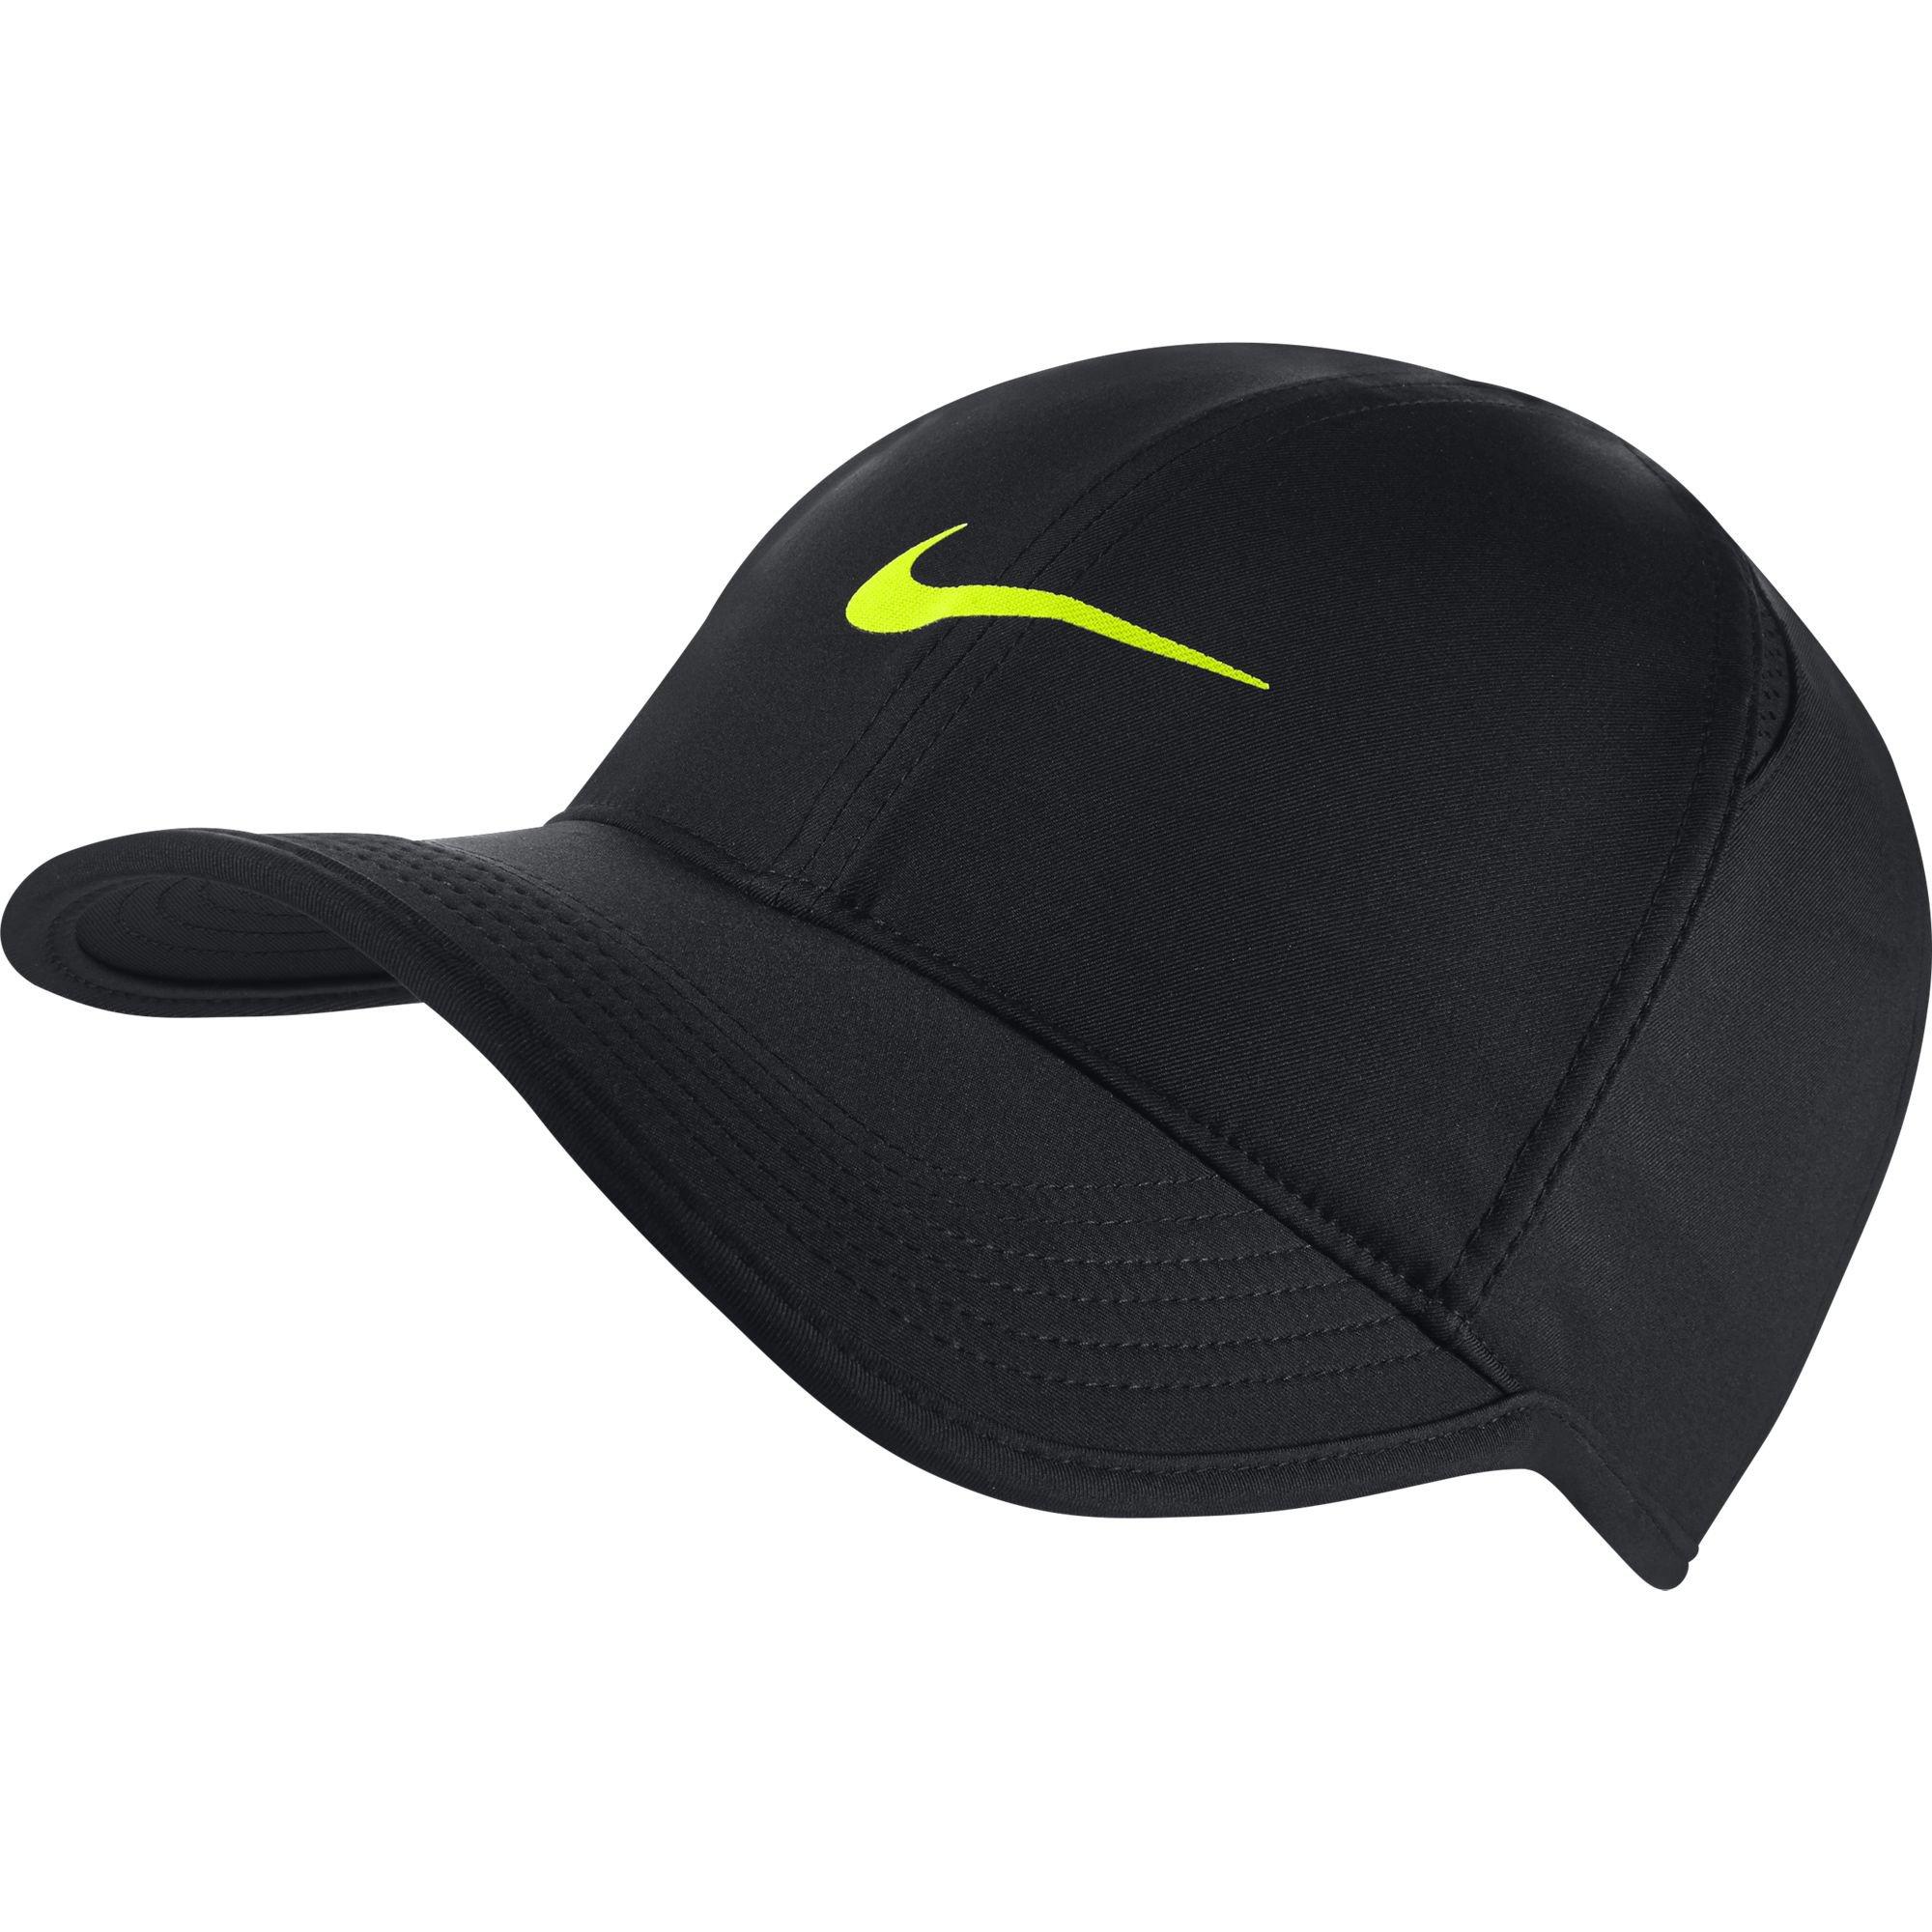 NIKE Feather Light Tennis Hat (BLACK/BLACK/VOLT, One Size)